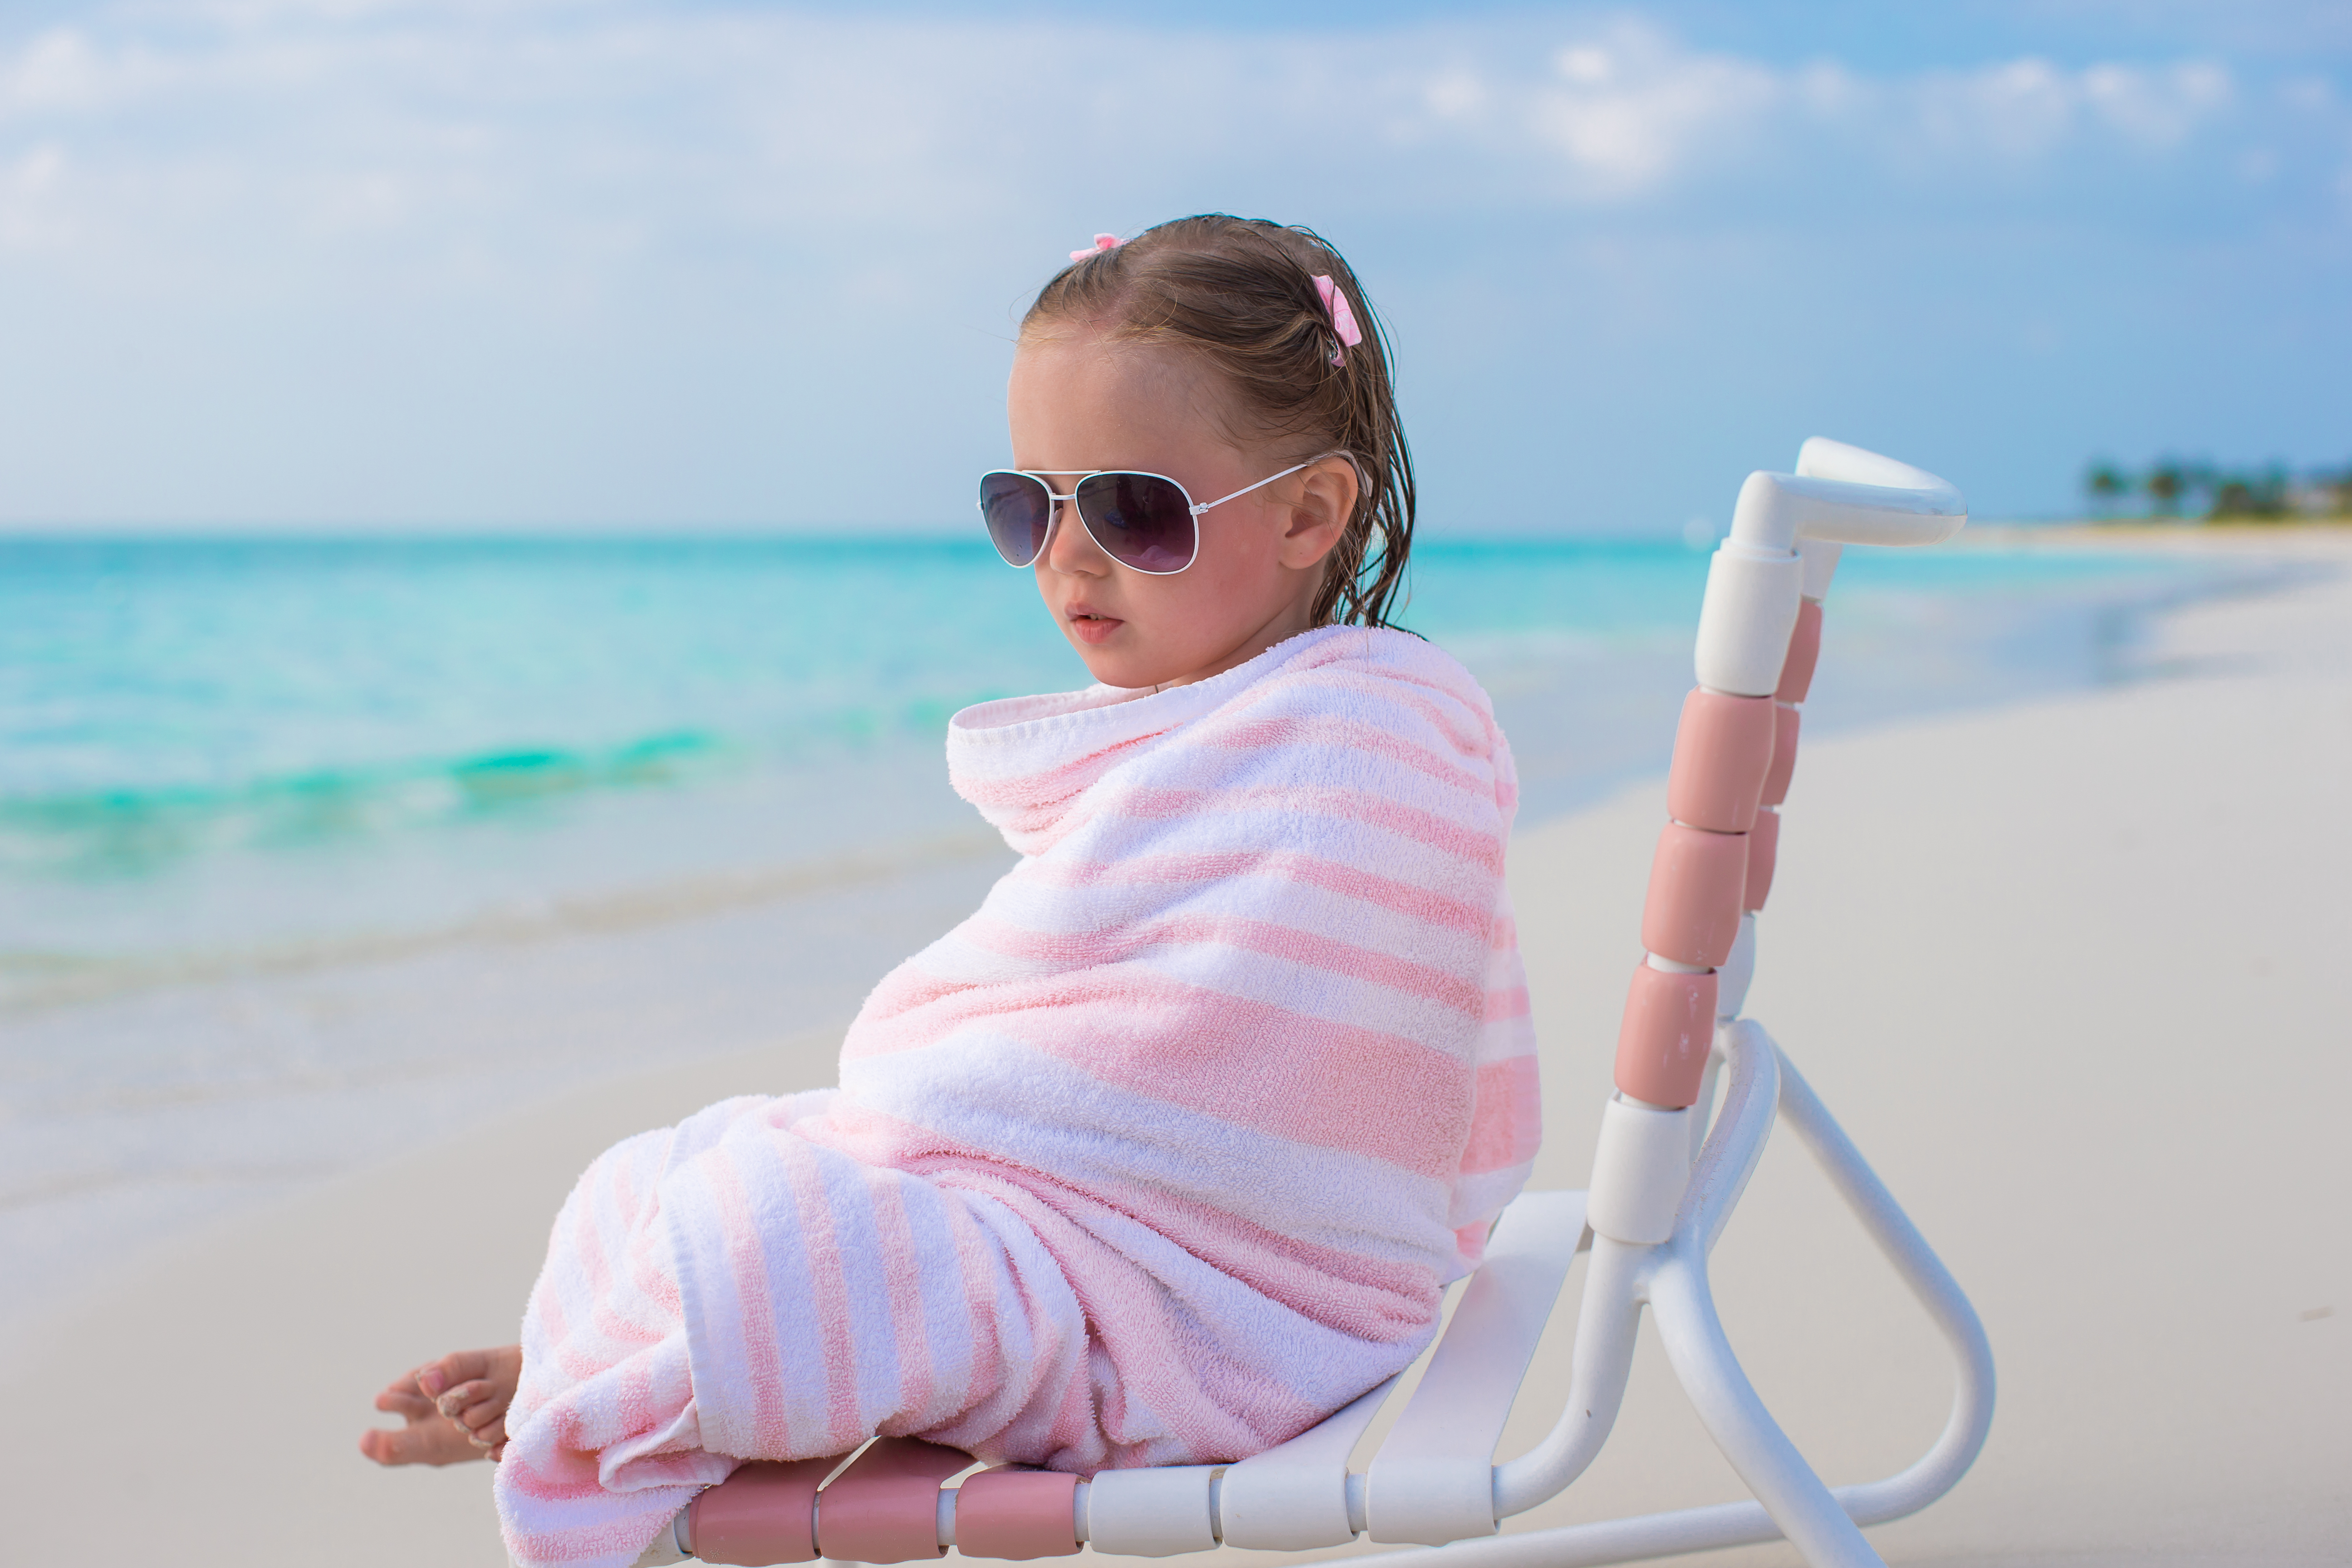 Jacquard velour beach towel.